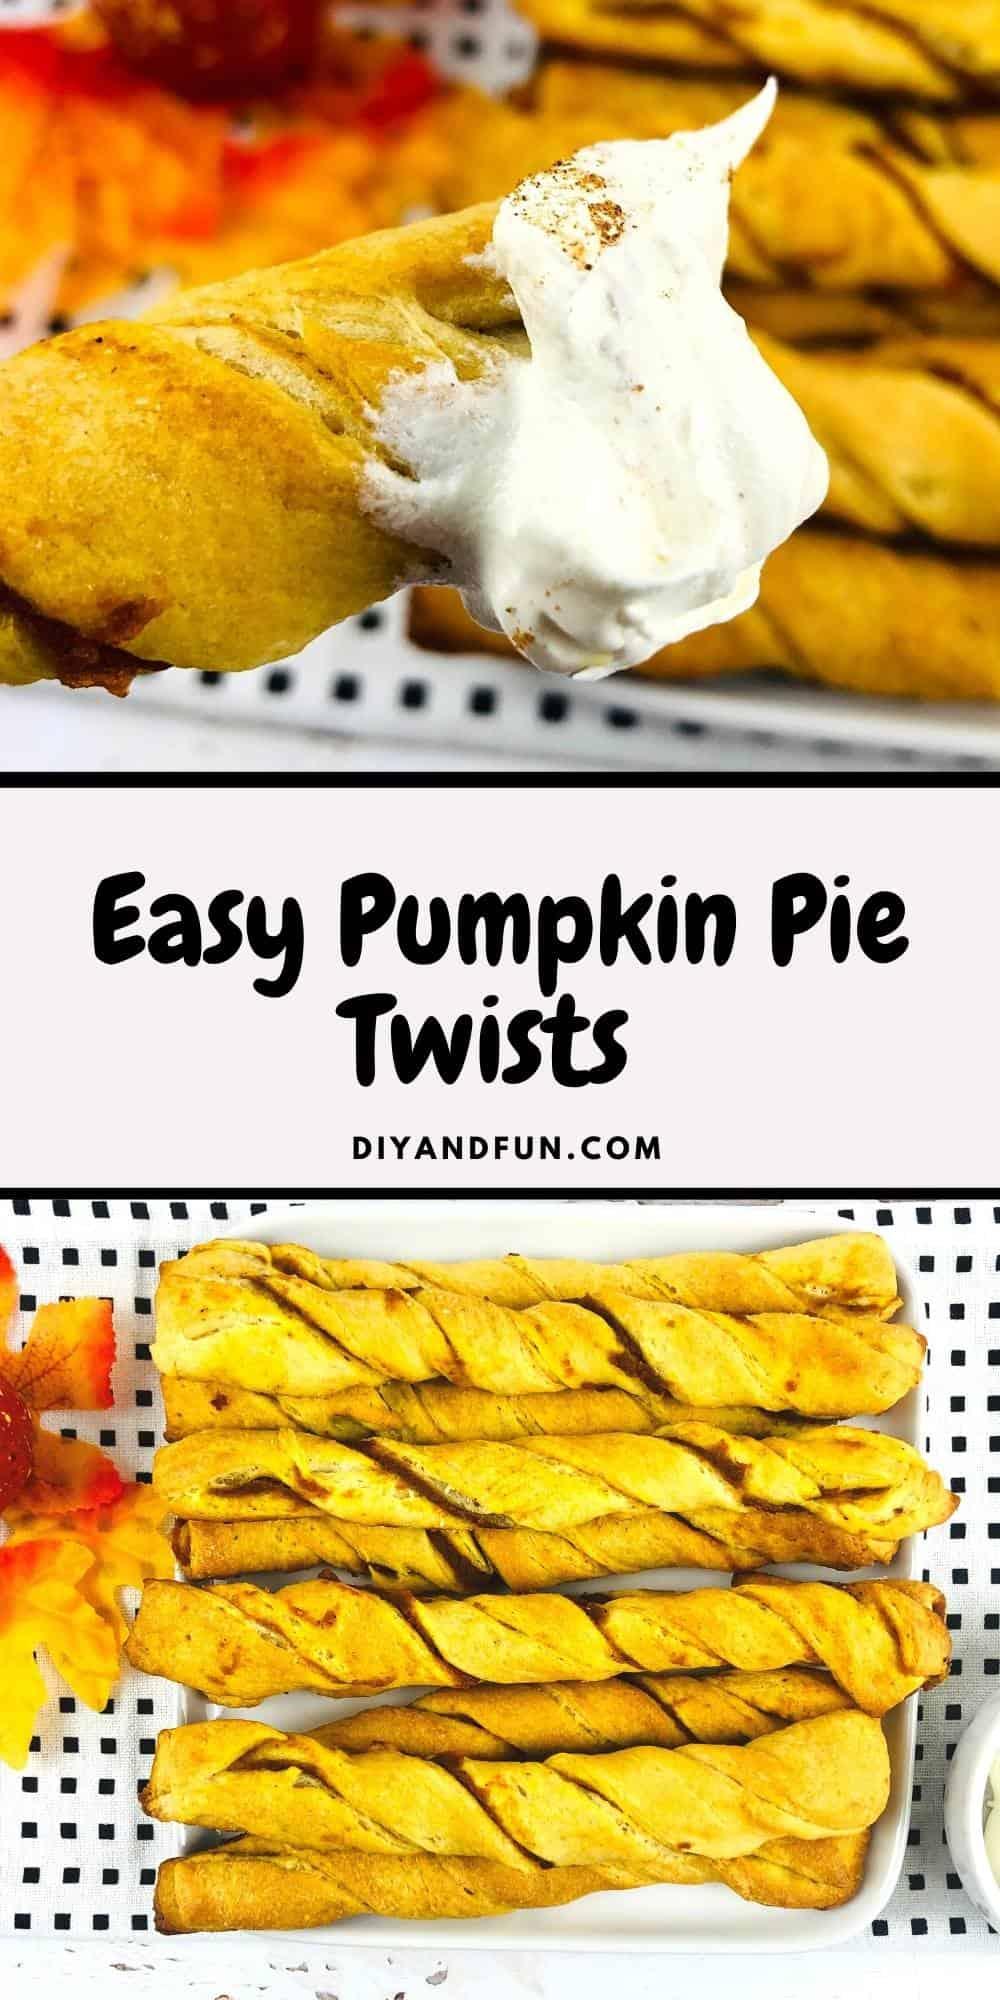 Crescent Dough Pumpkin Pie Twists, bread sticks stuffed with pumpkin pie. A simple breakfast, brunch, or snack idea .